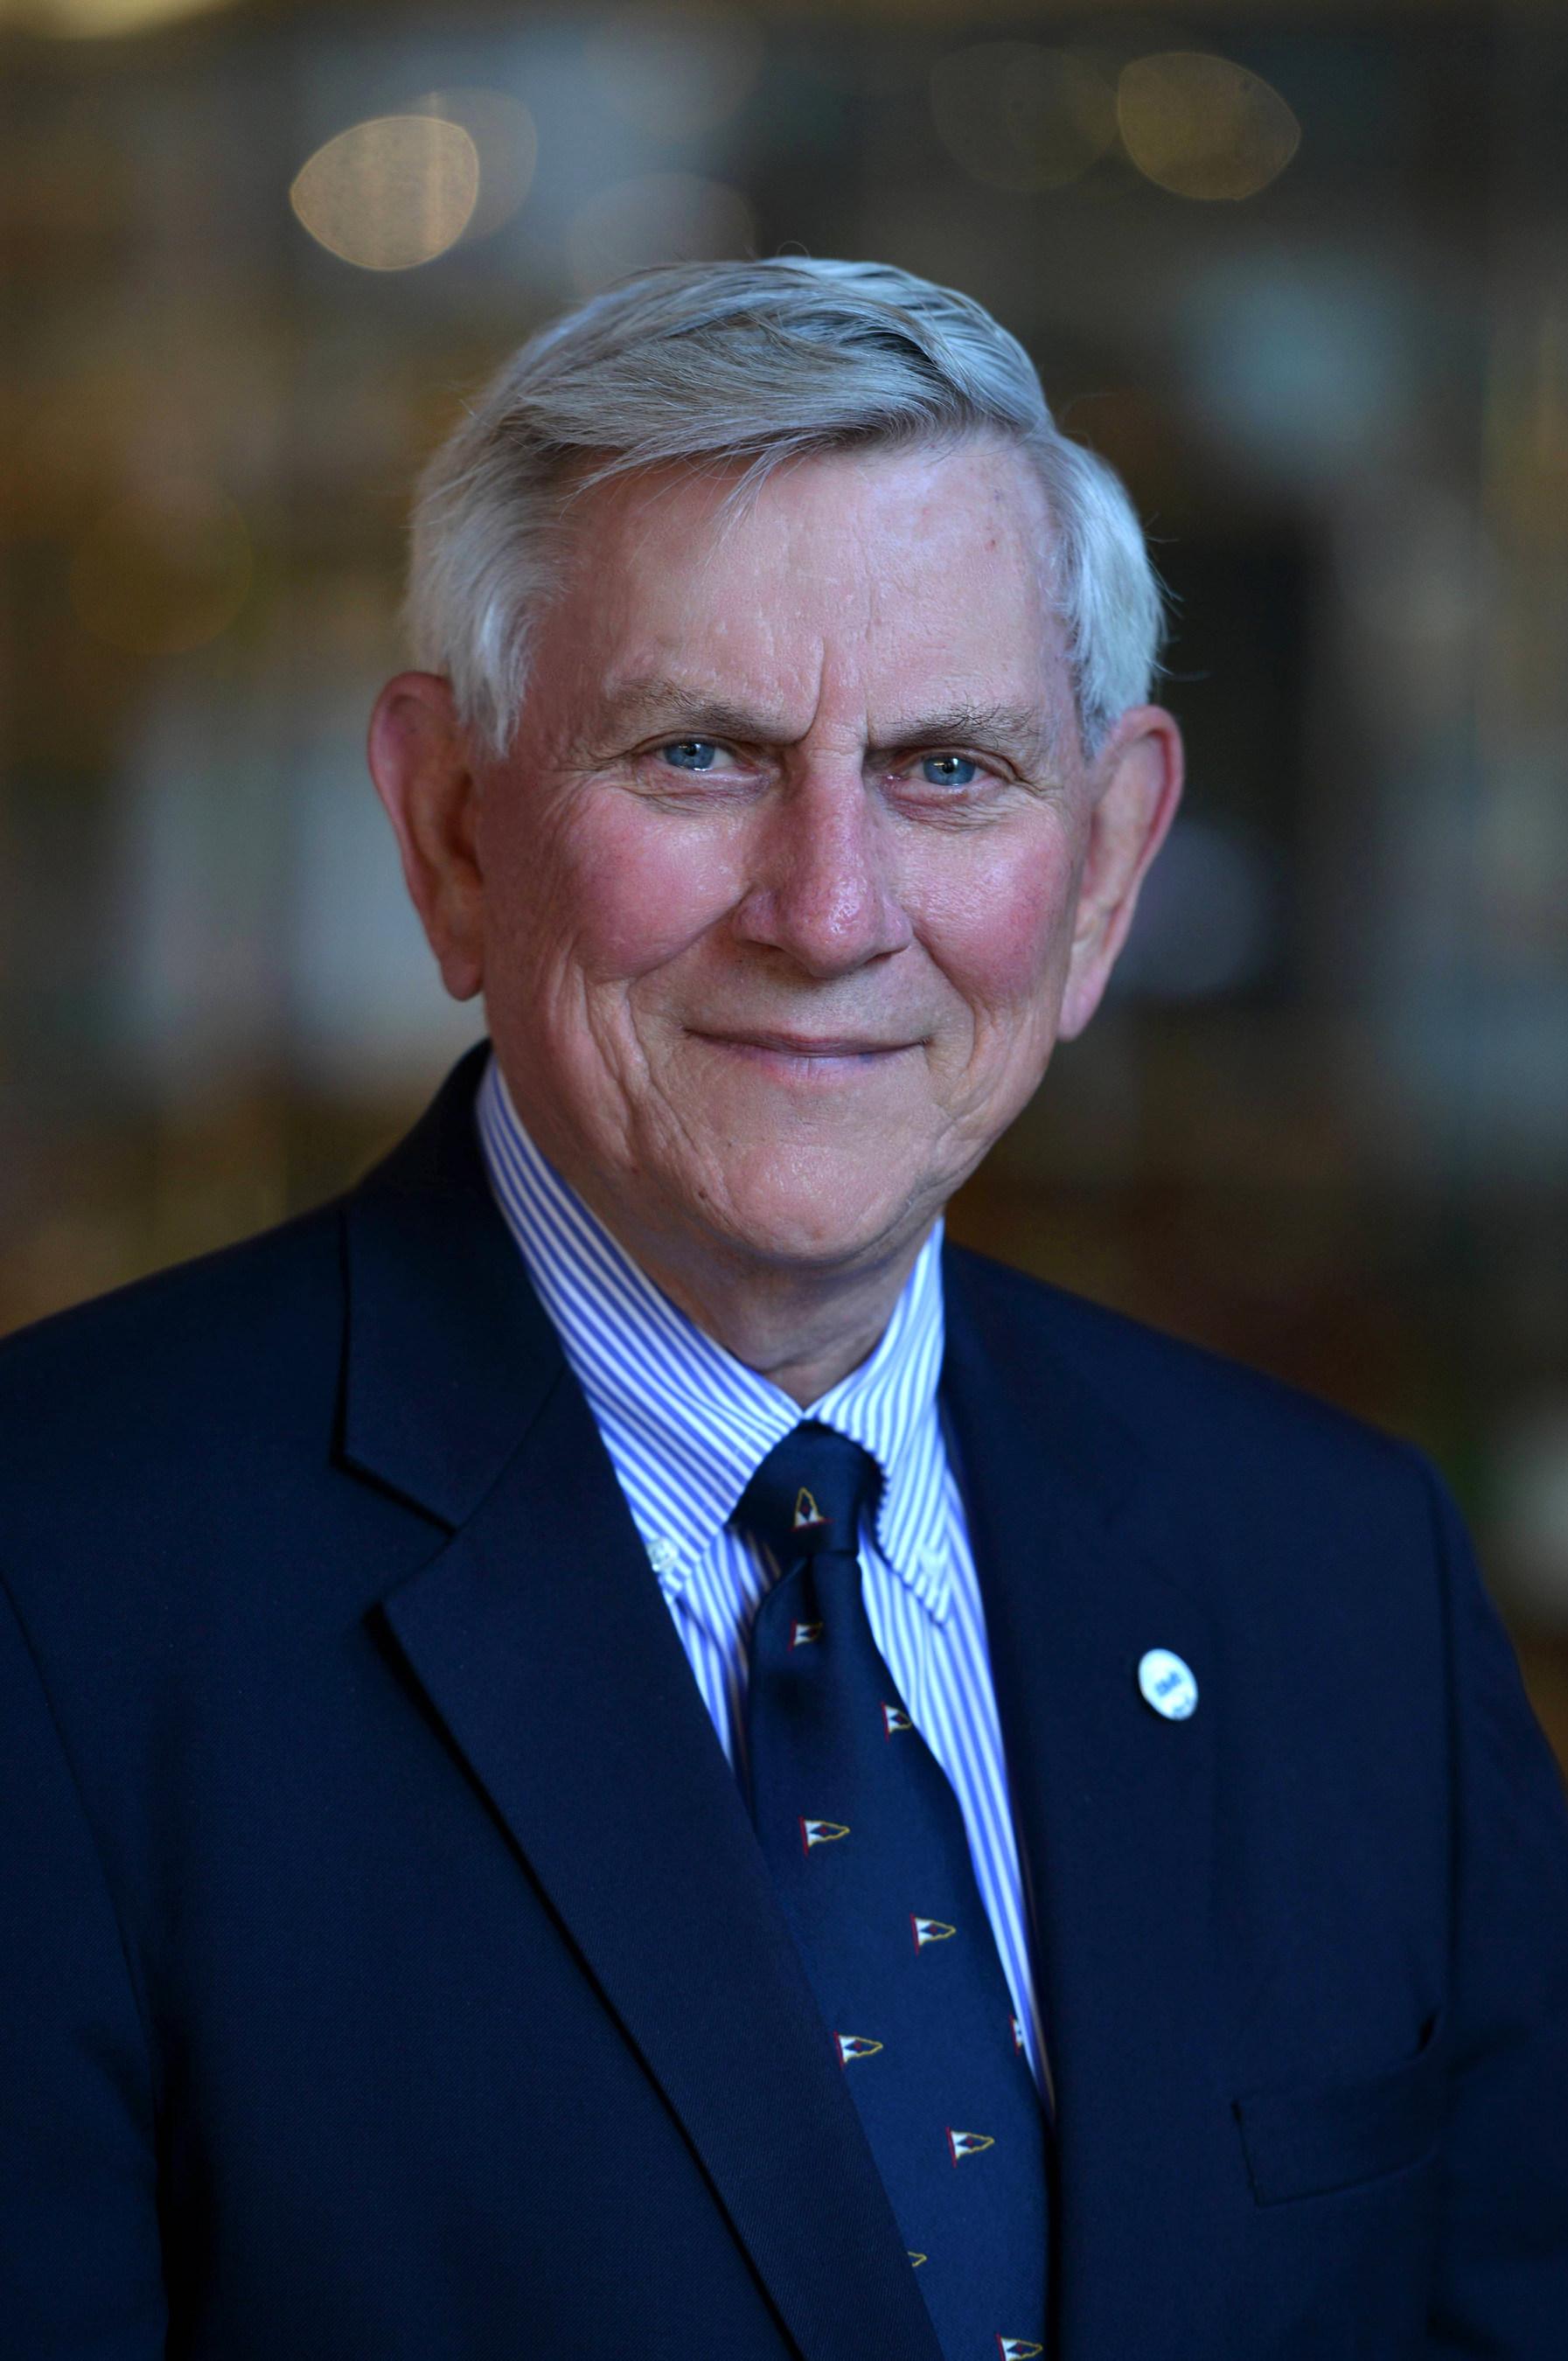 Dr Thomas Caskey, Senior Vice President for Medical Science and Diagnostics, NextCODE Health